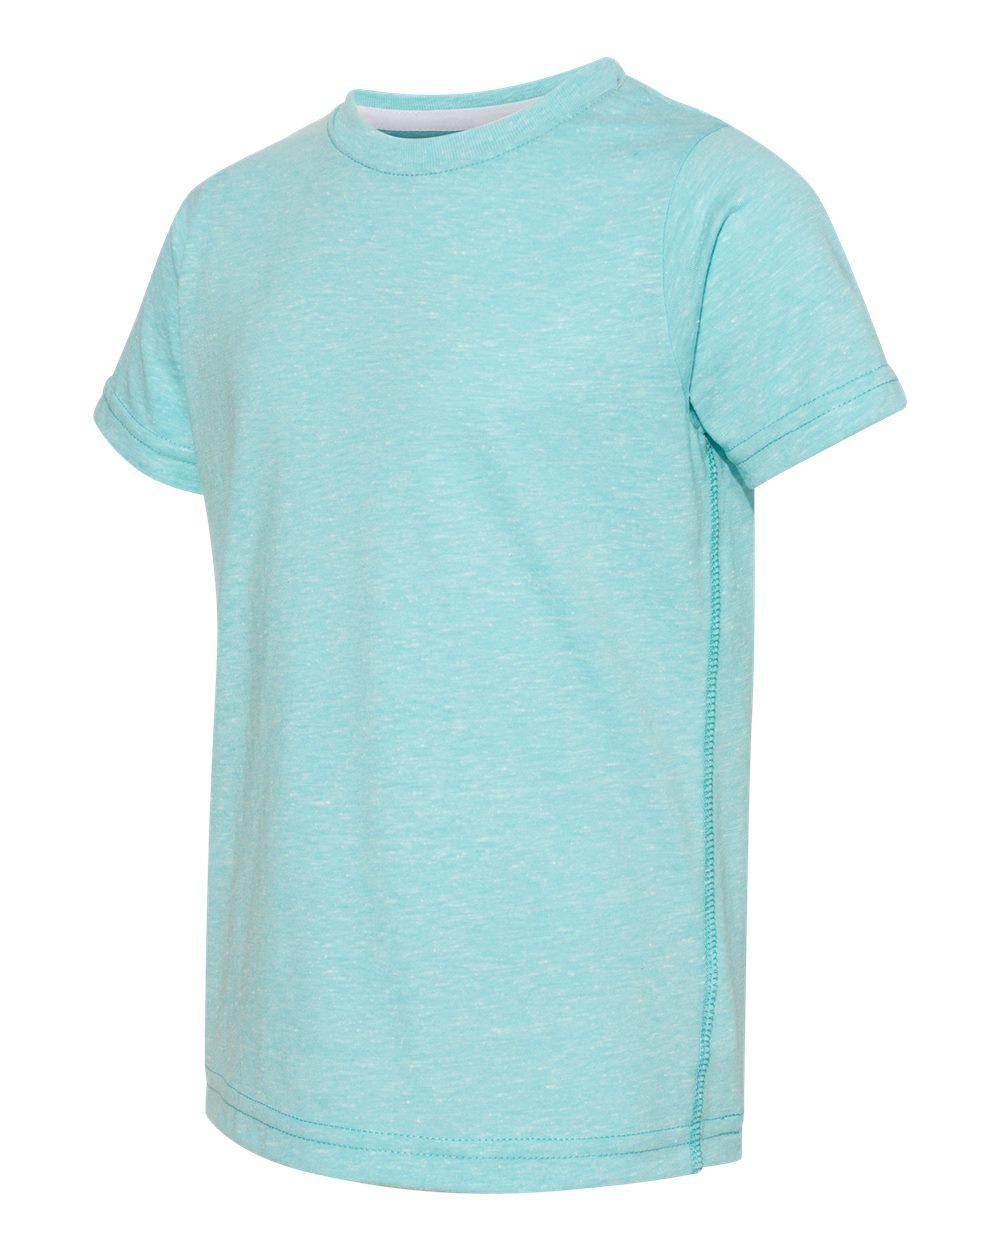 Rabbit Skins 3391 - Toddler Harborside Melange T-Shirt